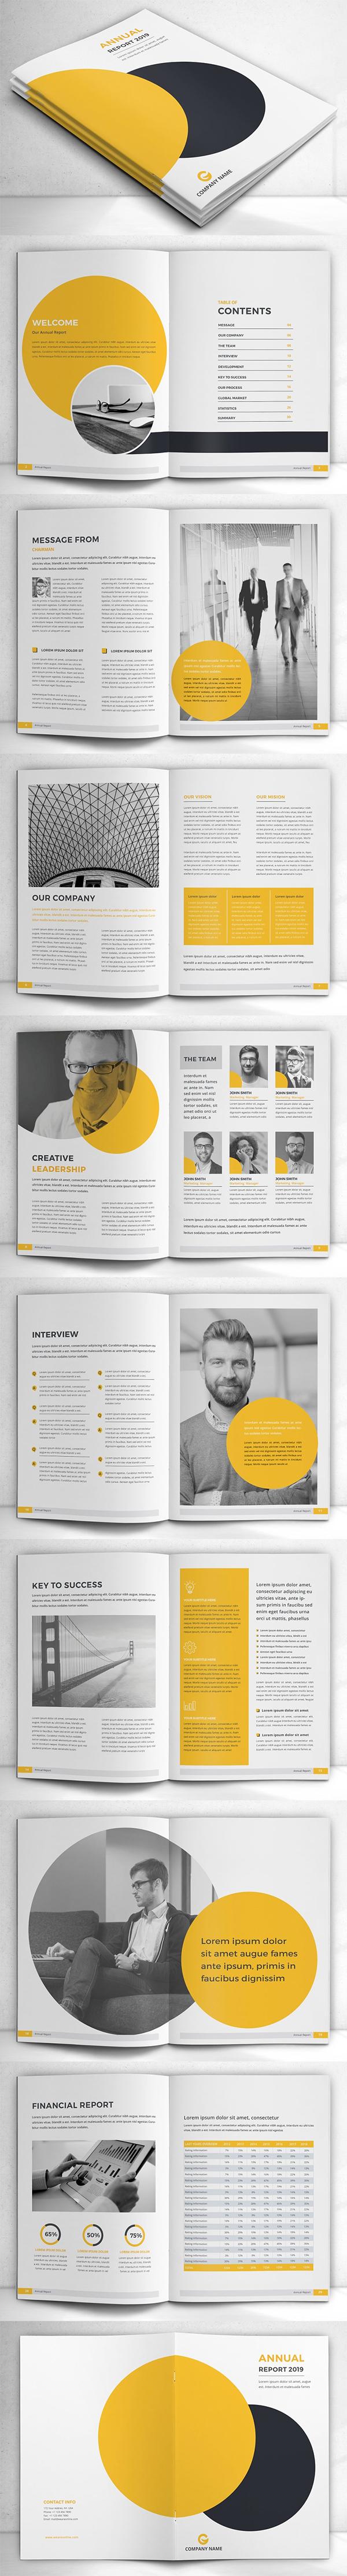 Simple Annual Report Brochure Template